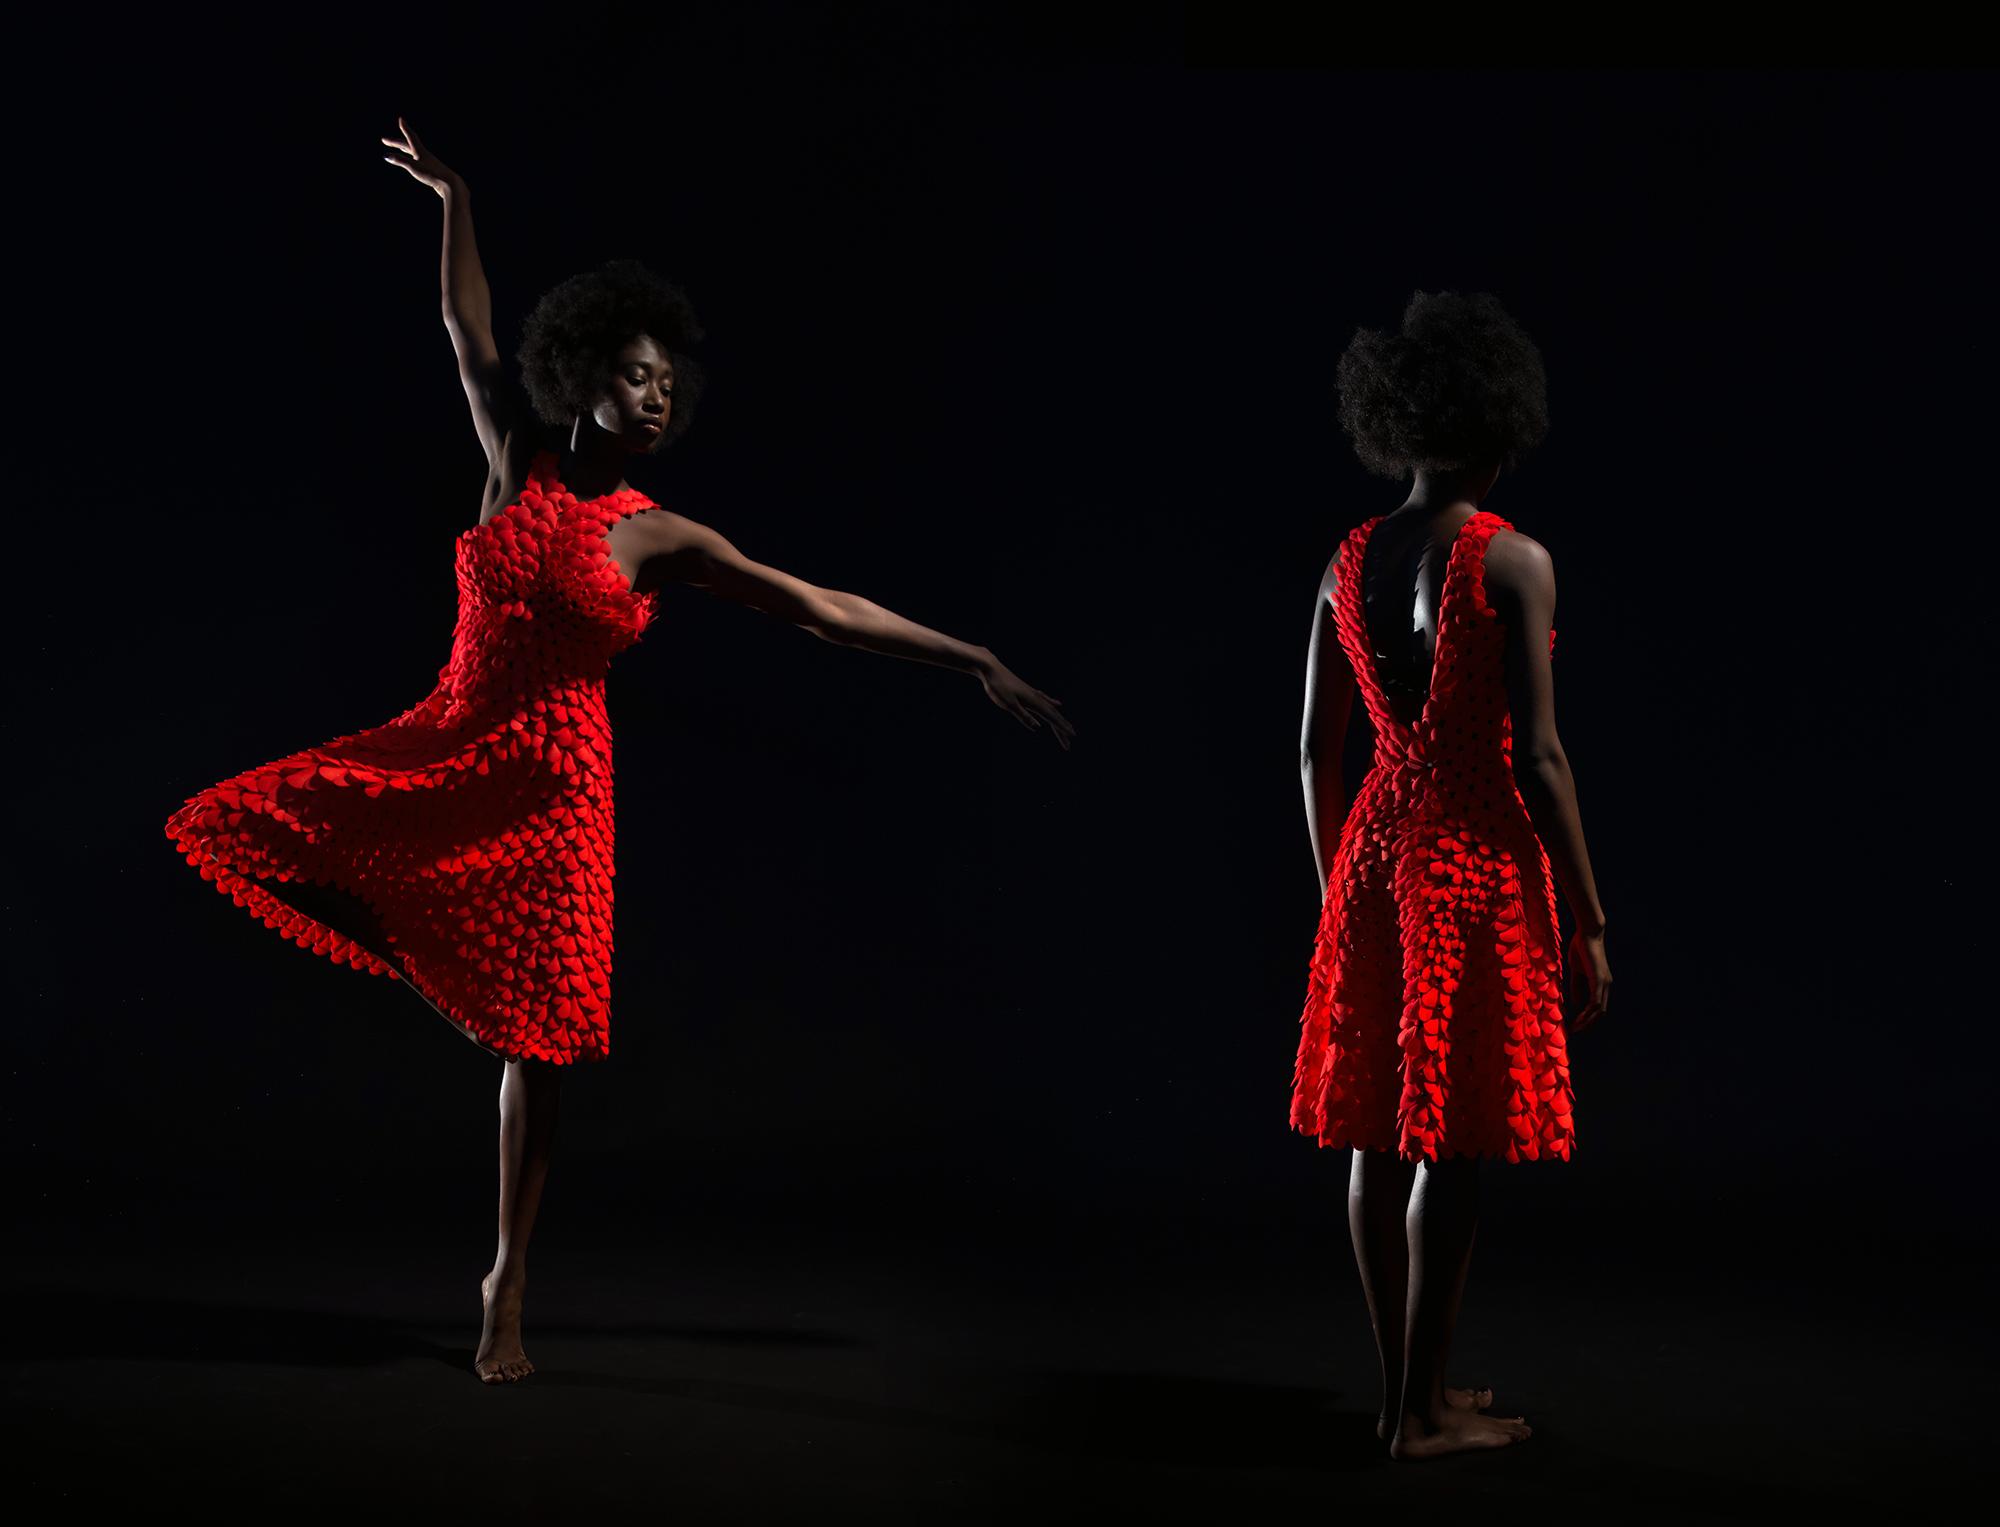 New Kinematic Petals Dress debuts at Powerhouse Museum